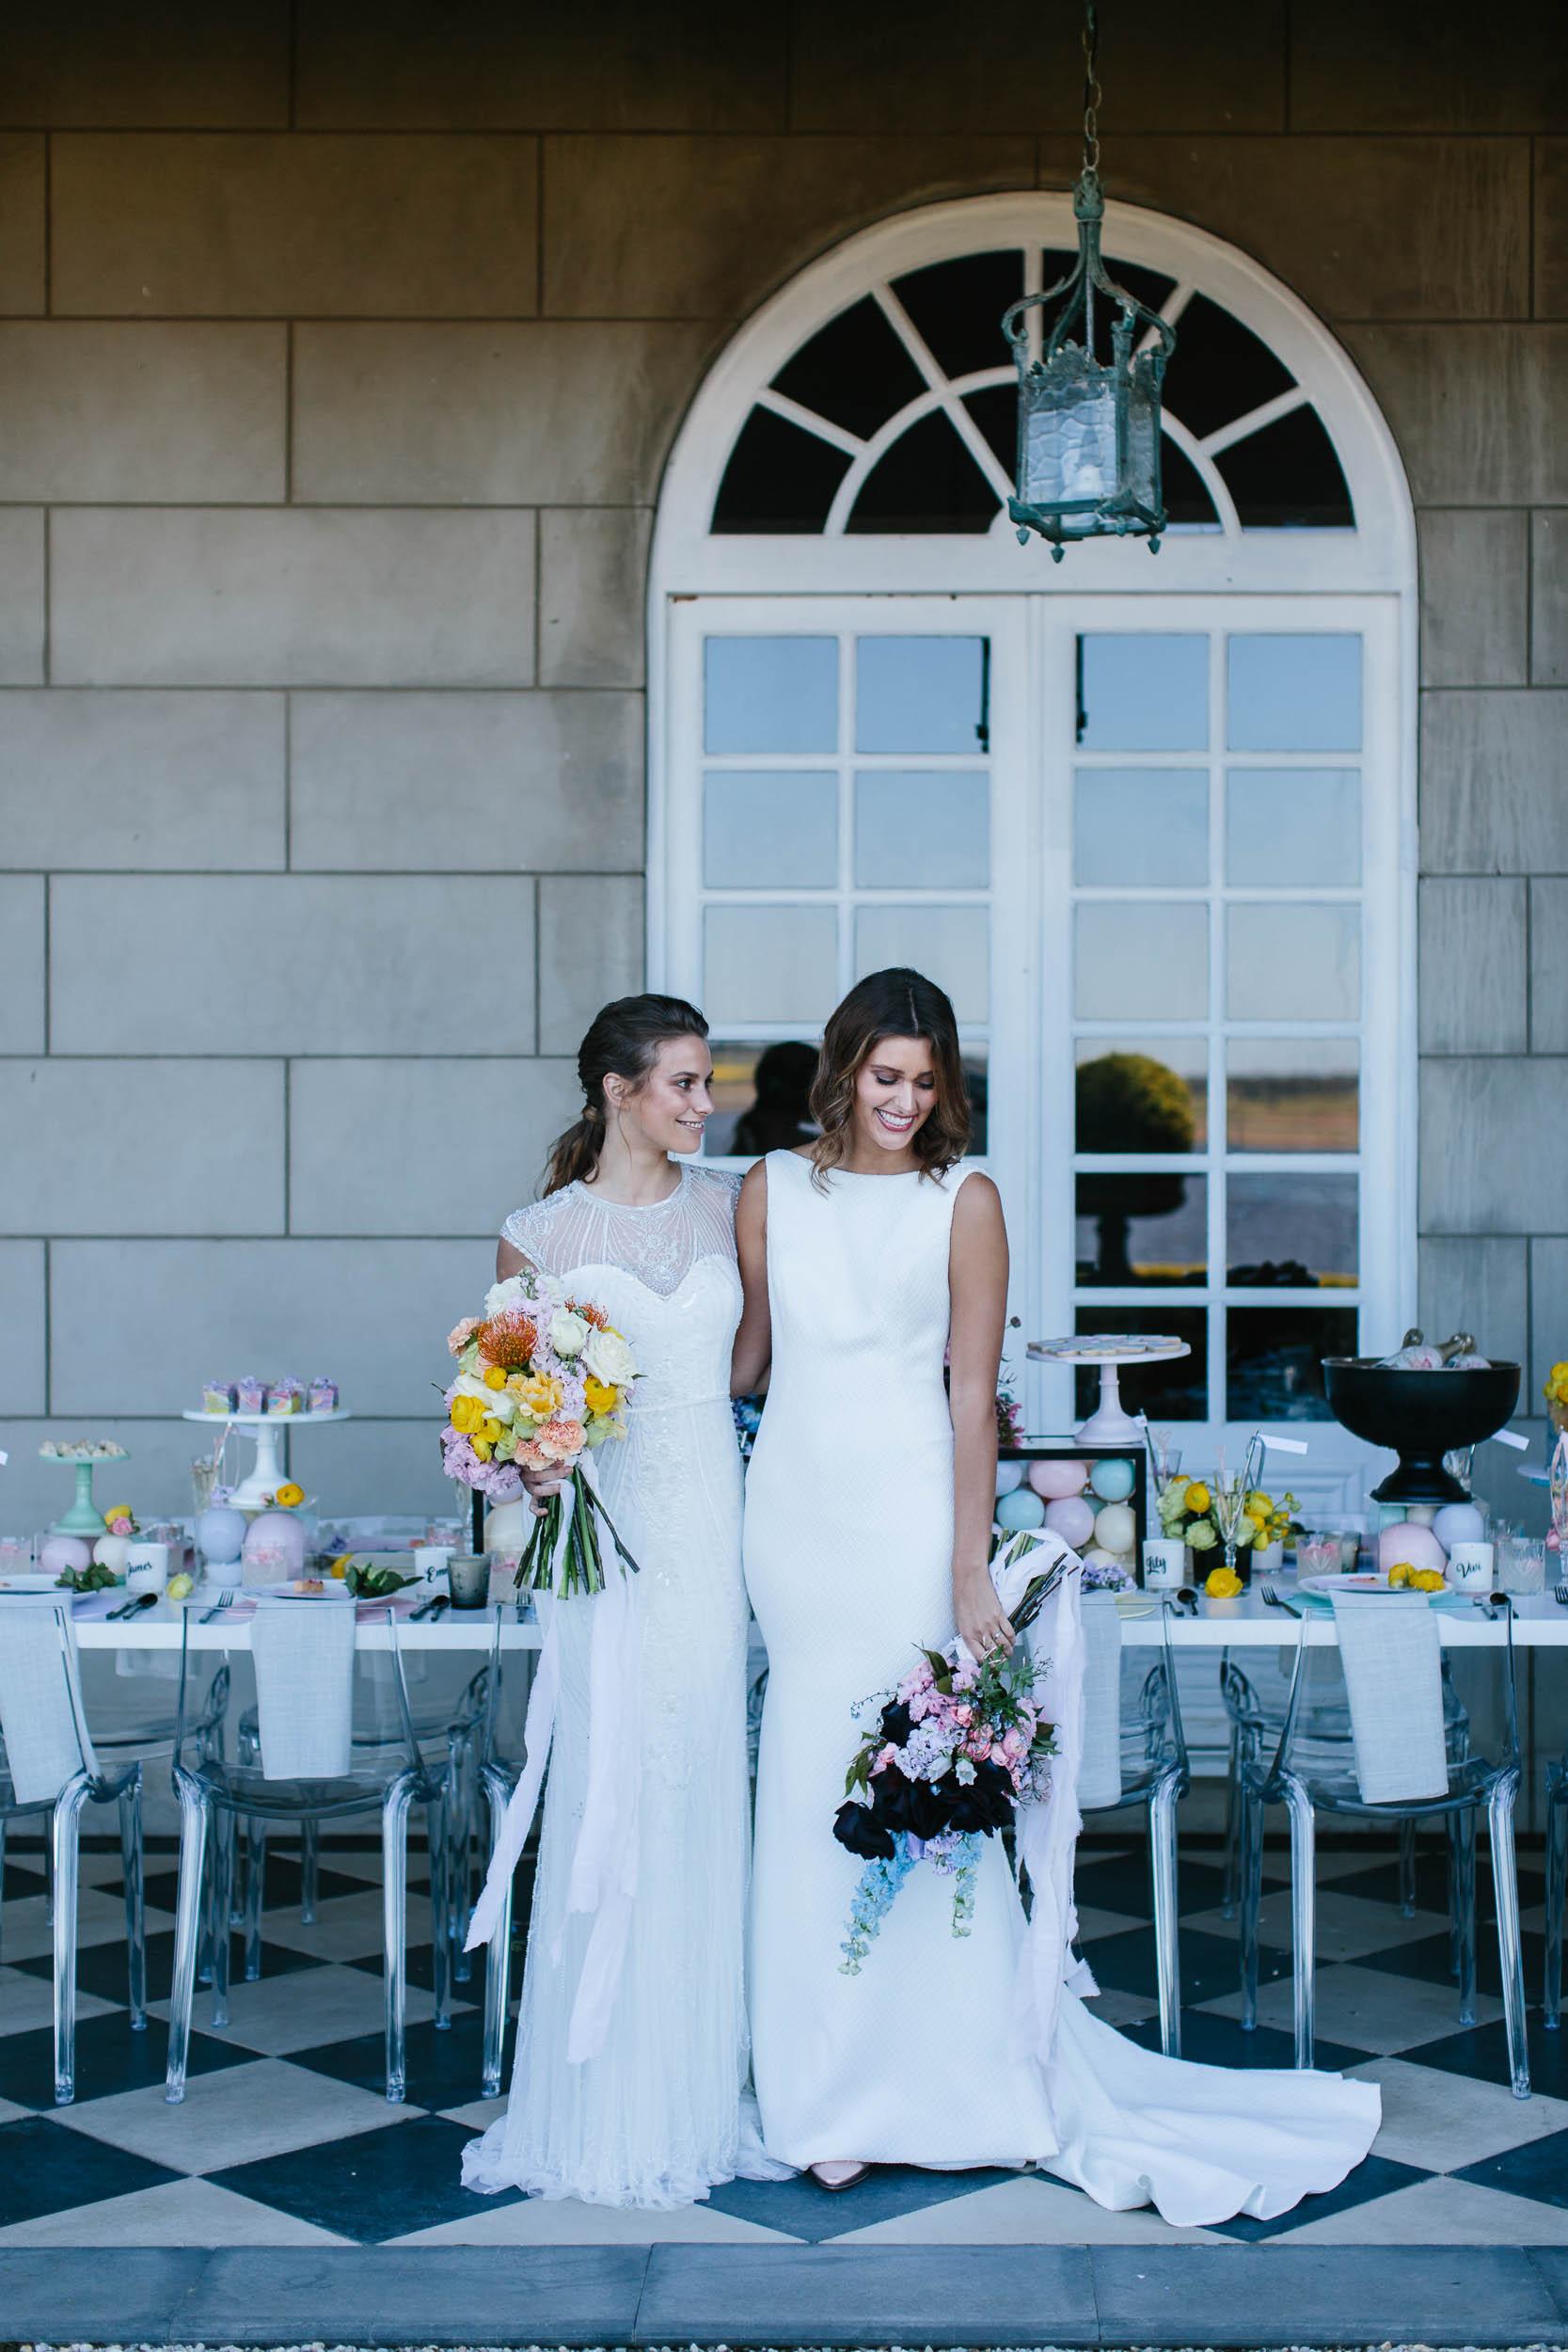 Same Sex Wedding Bridal Photos | Wedding Photography by Kas Richards